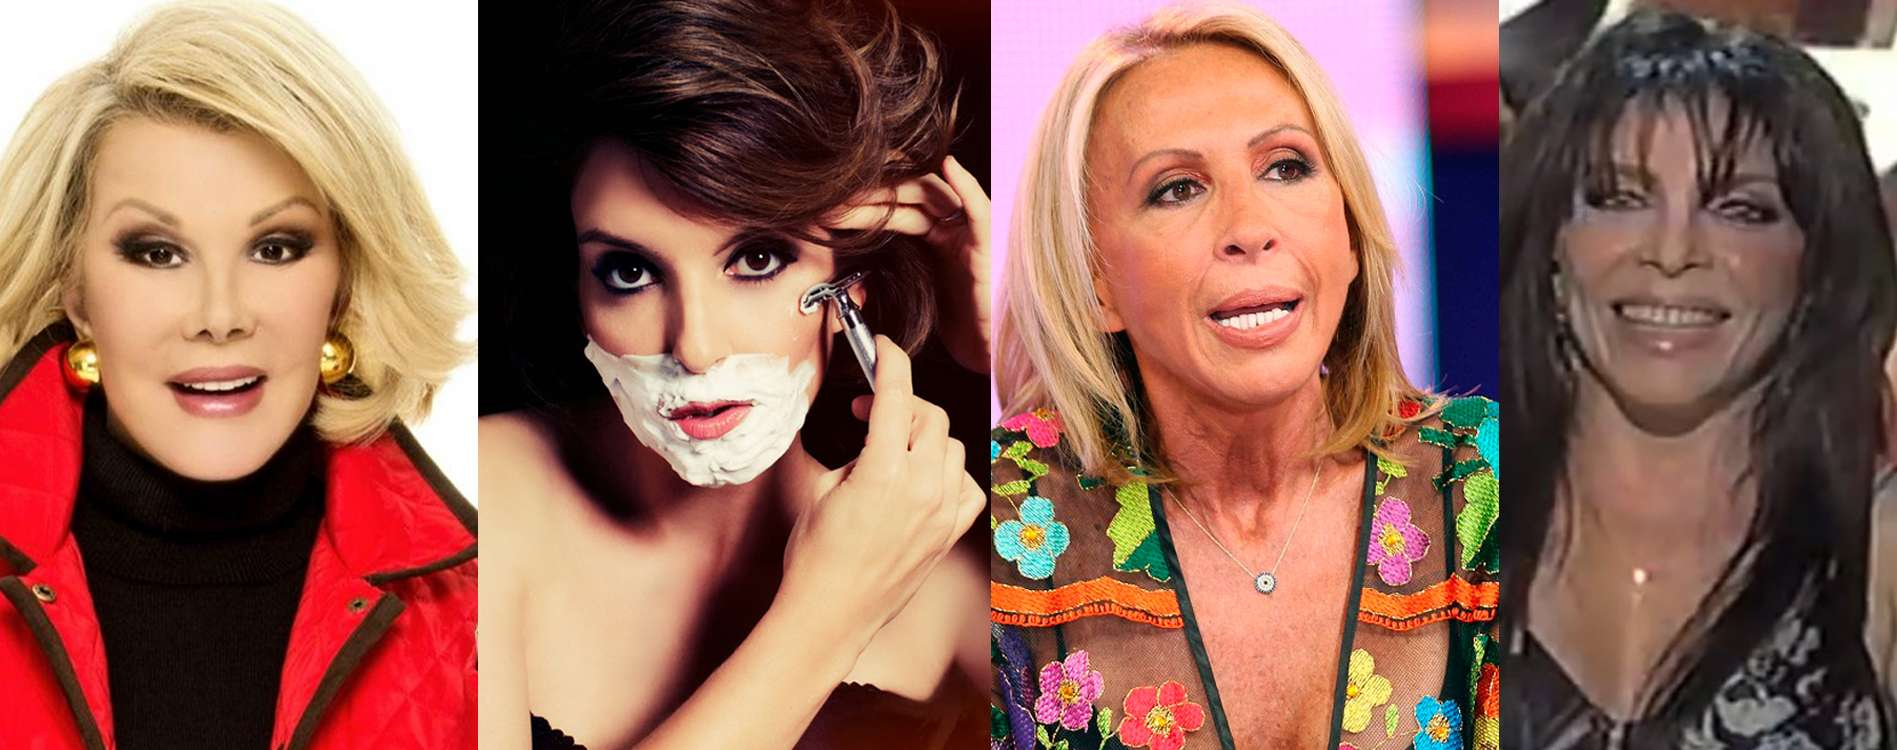 Twitter, NBC, Televisa, YouTube